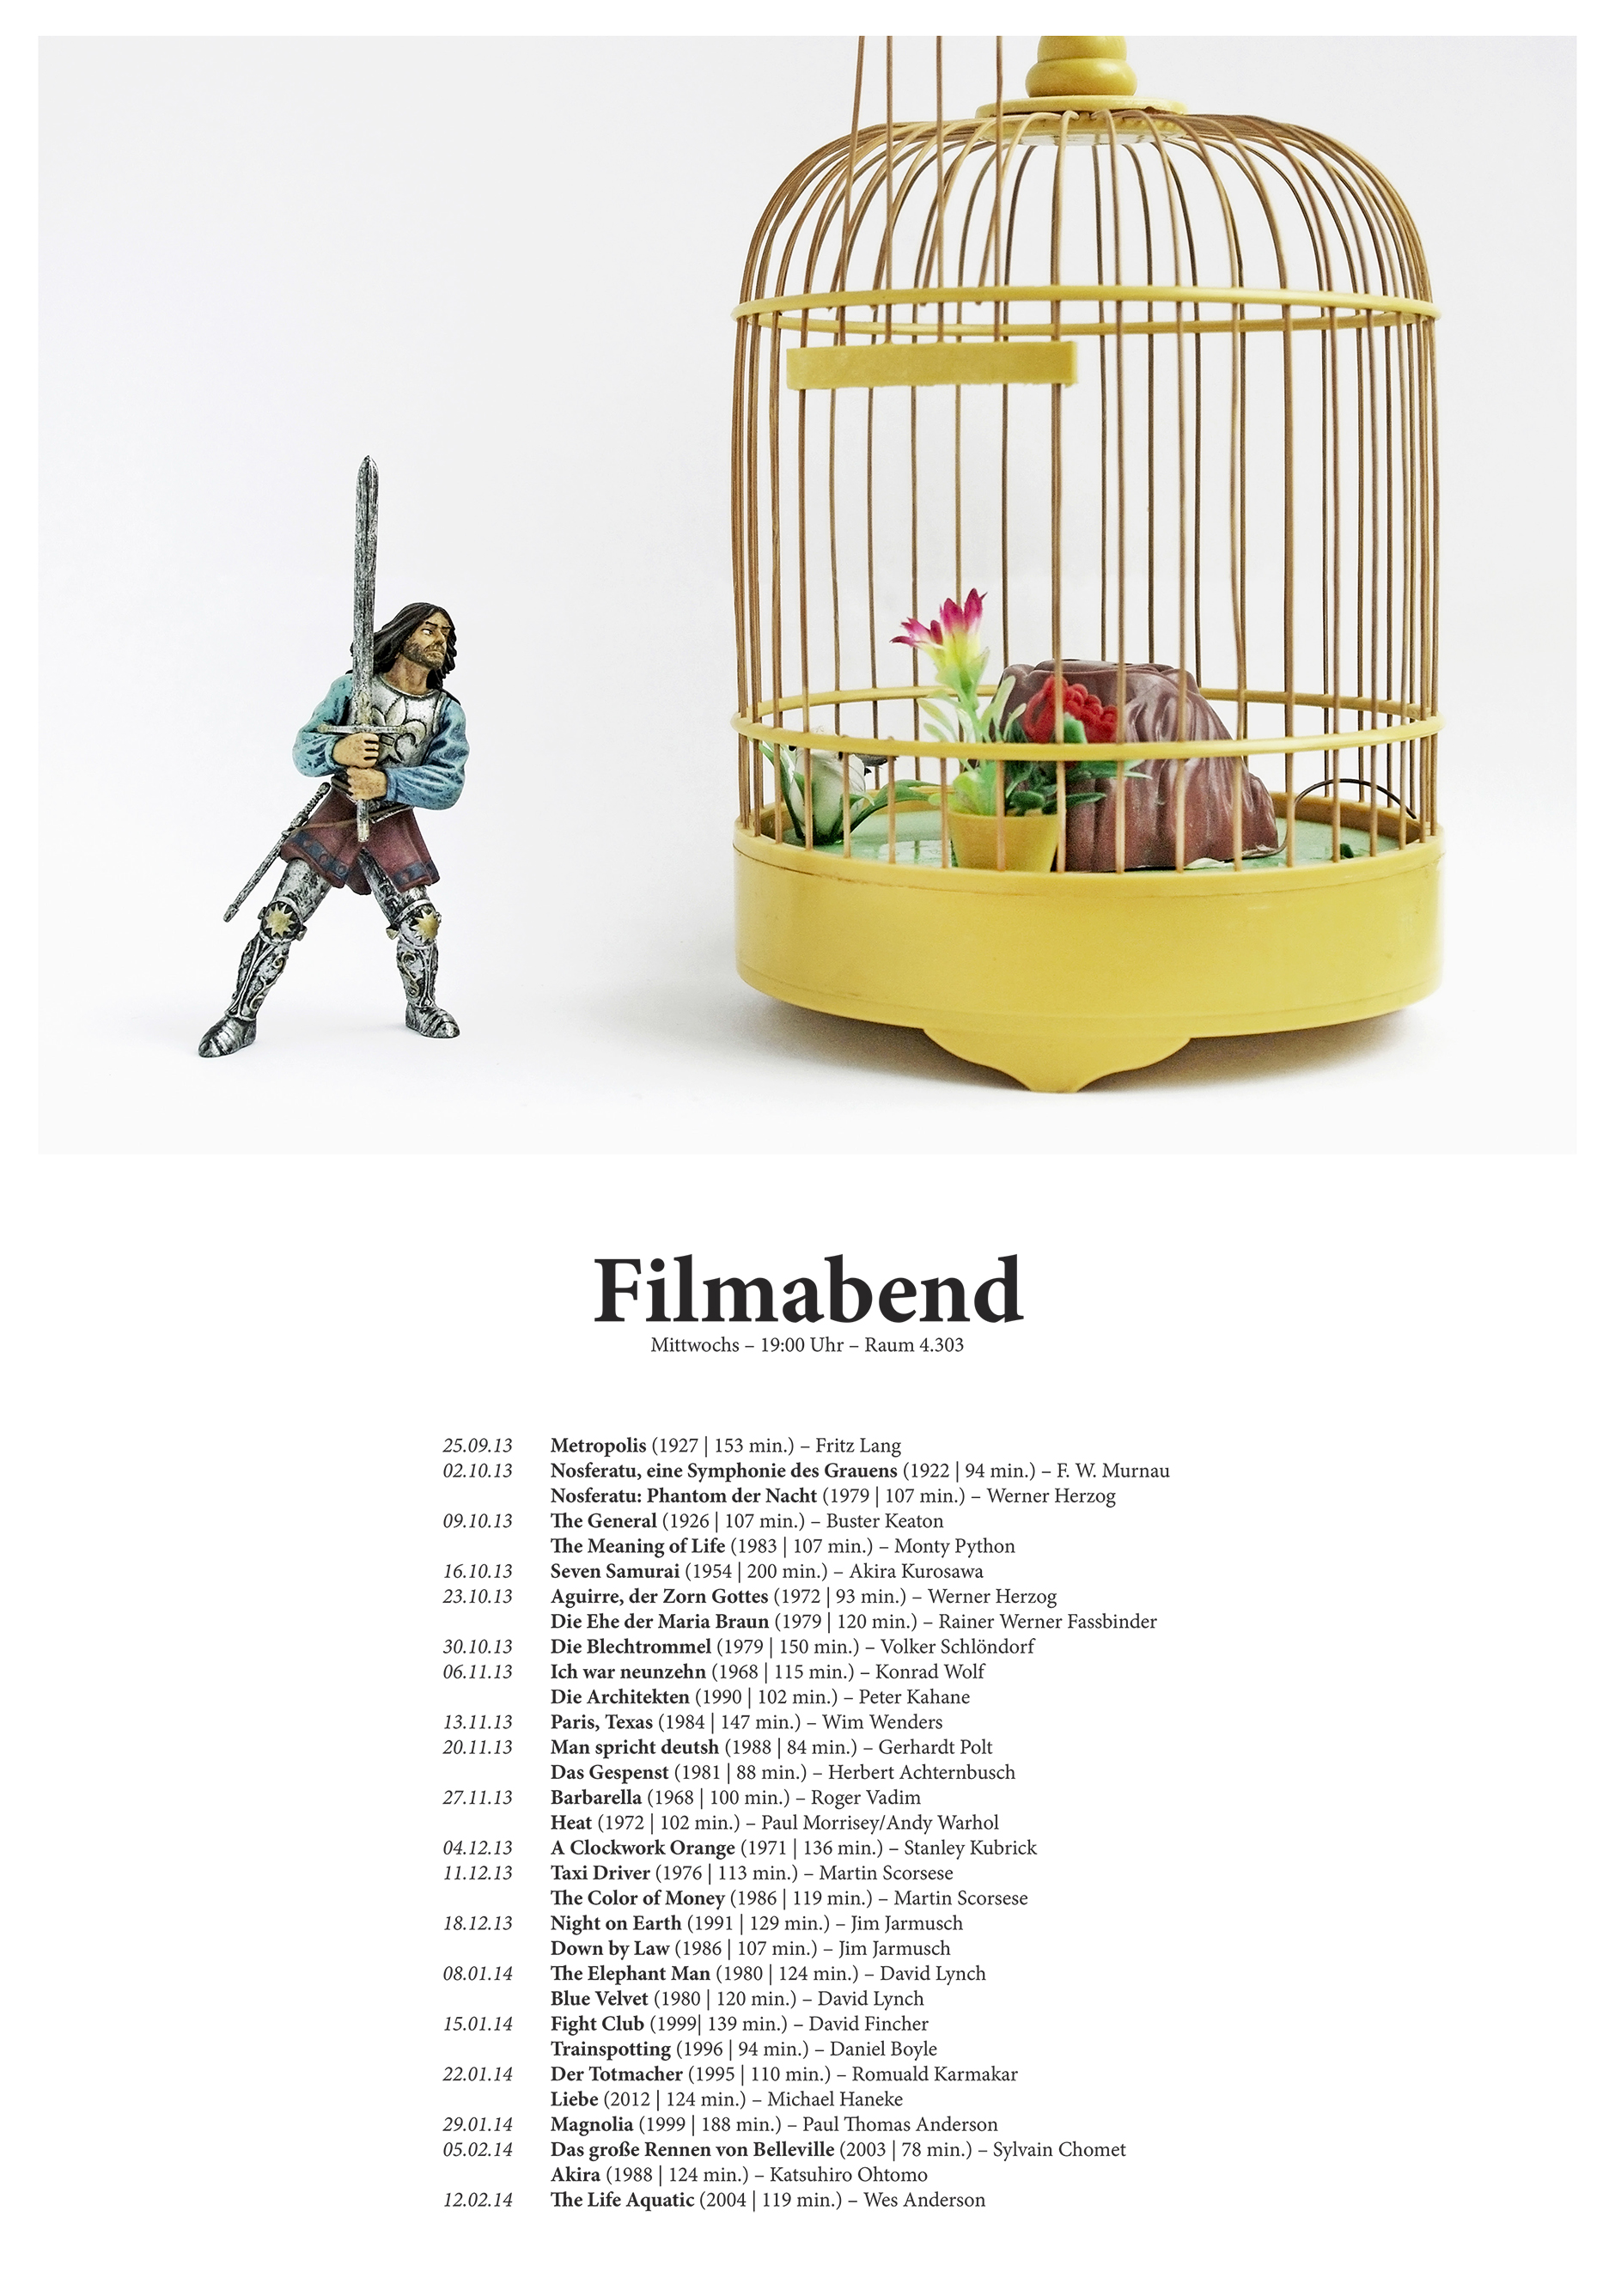 Poster and Photo: Matthias Ries